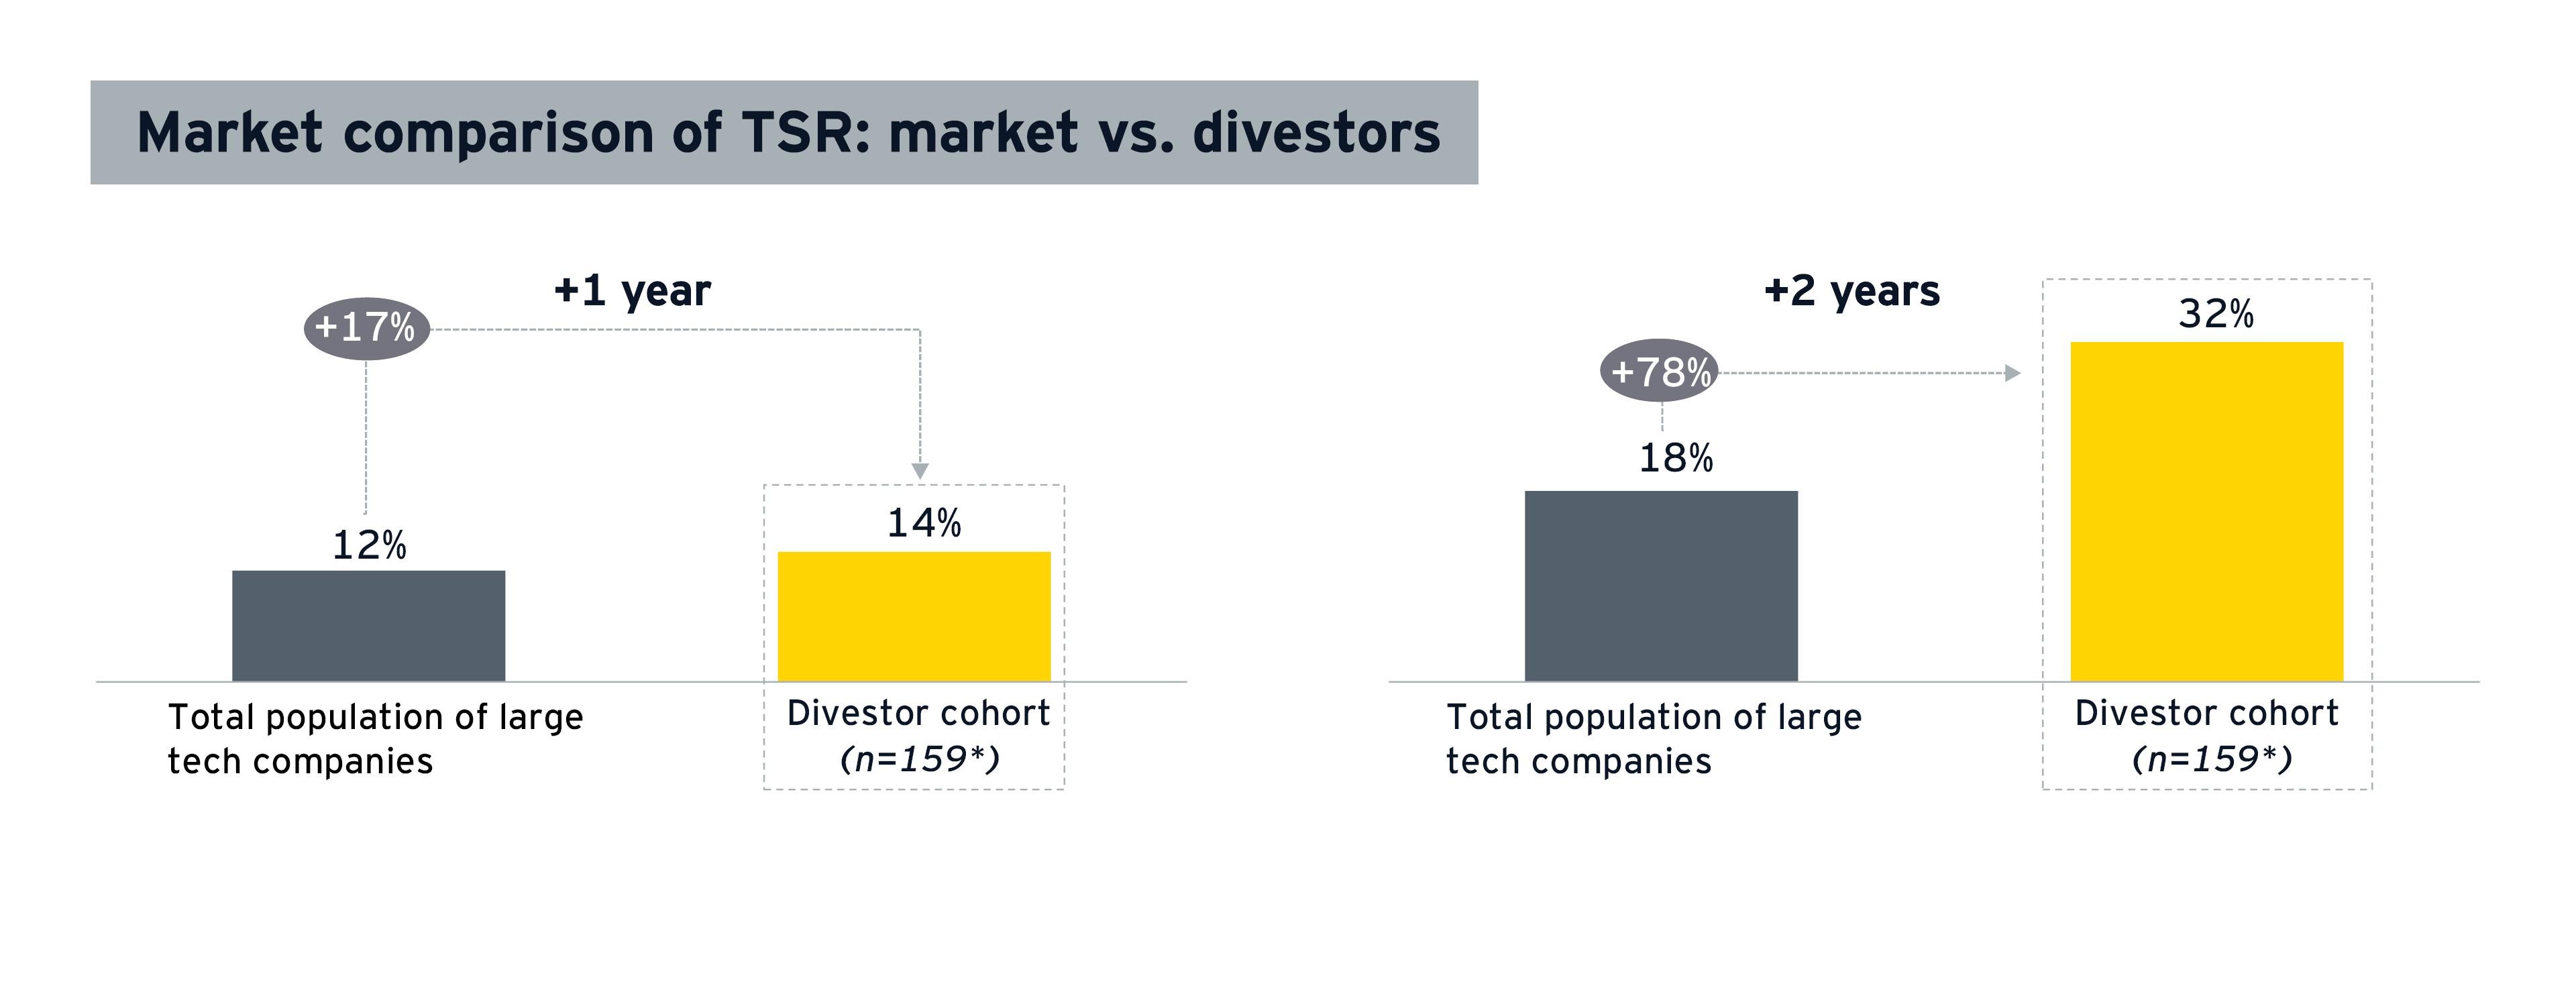 Total shareholder return for market vs. divestors for tech company divestments